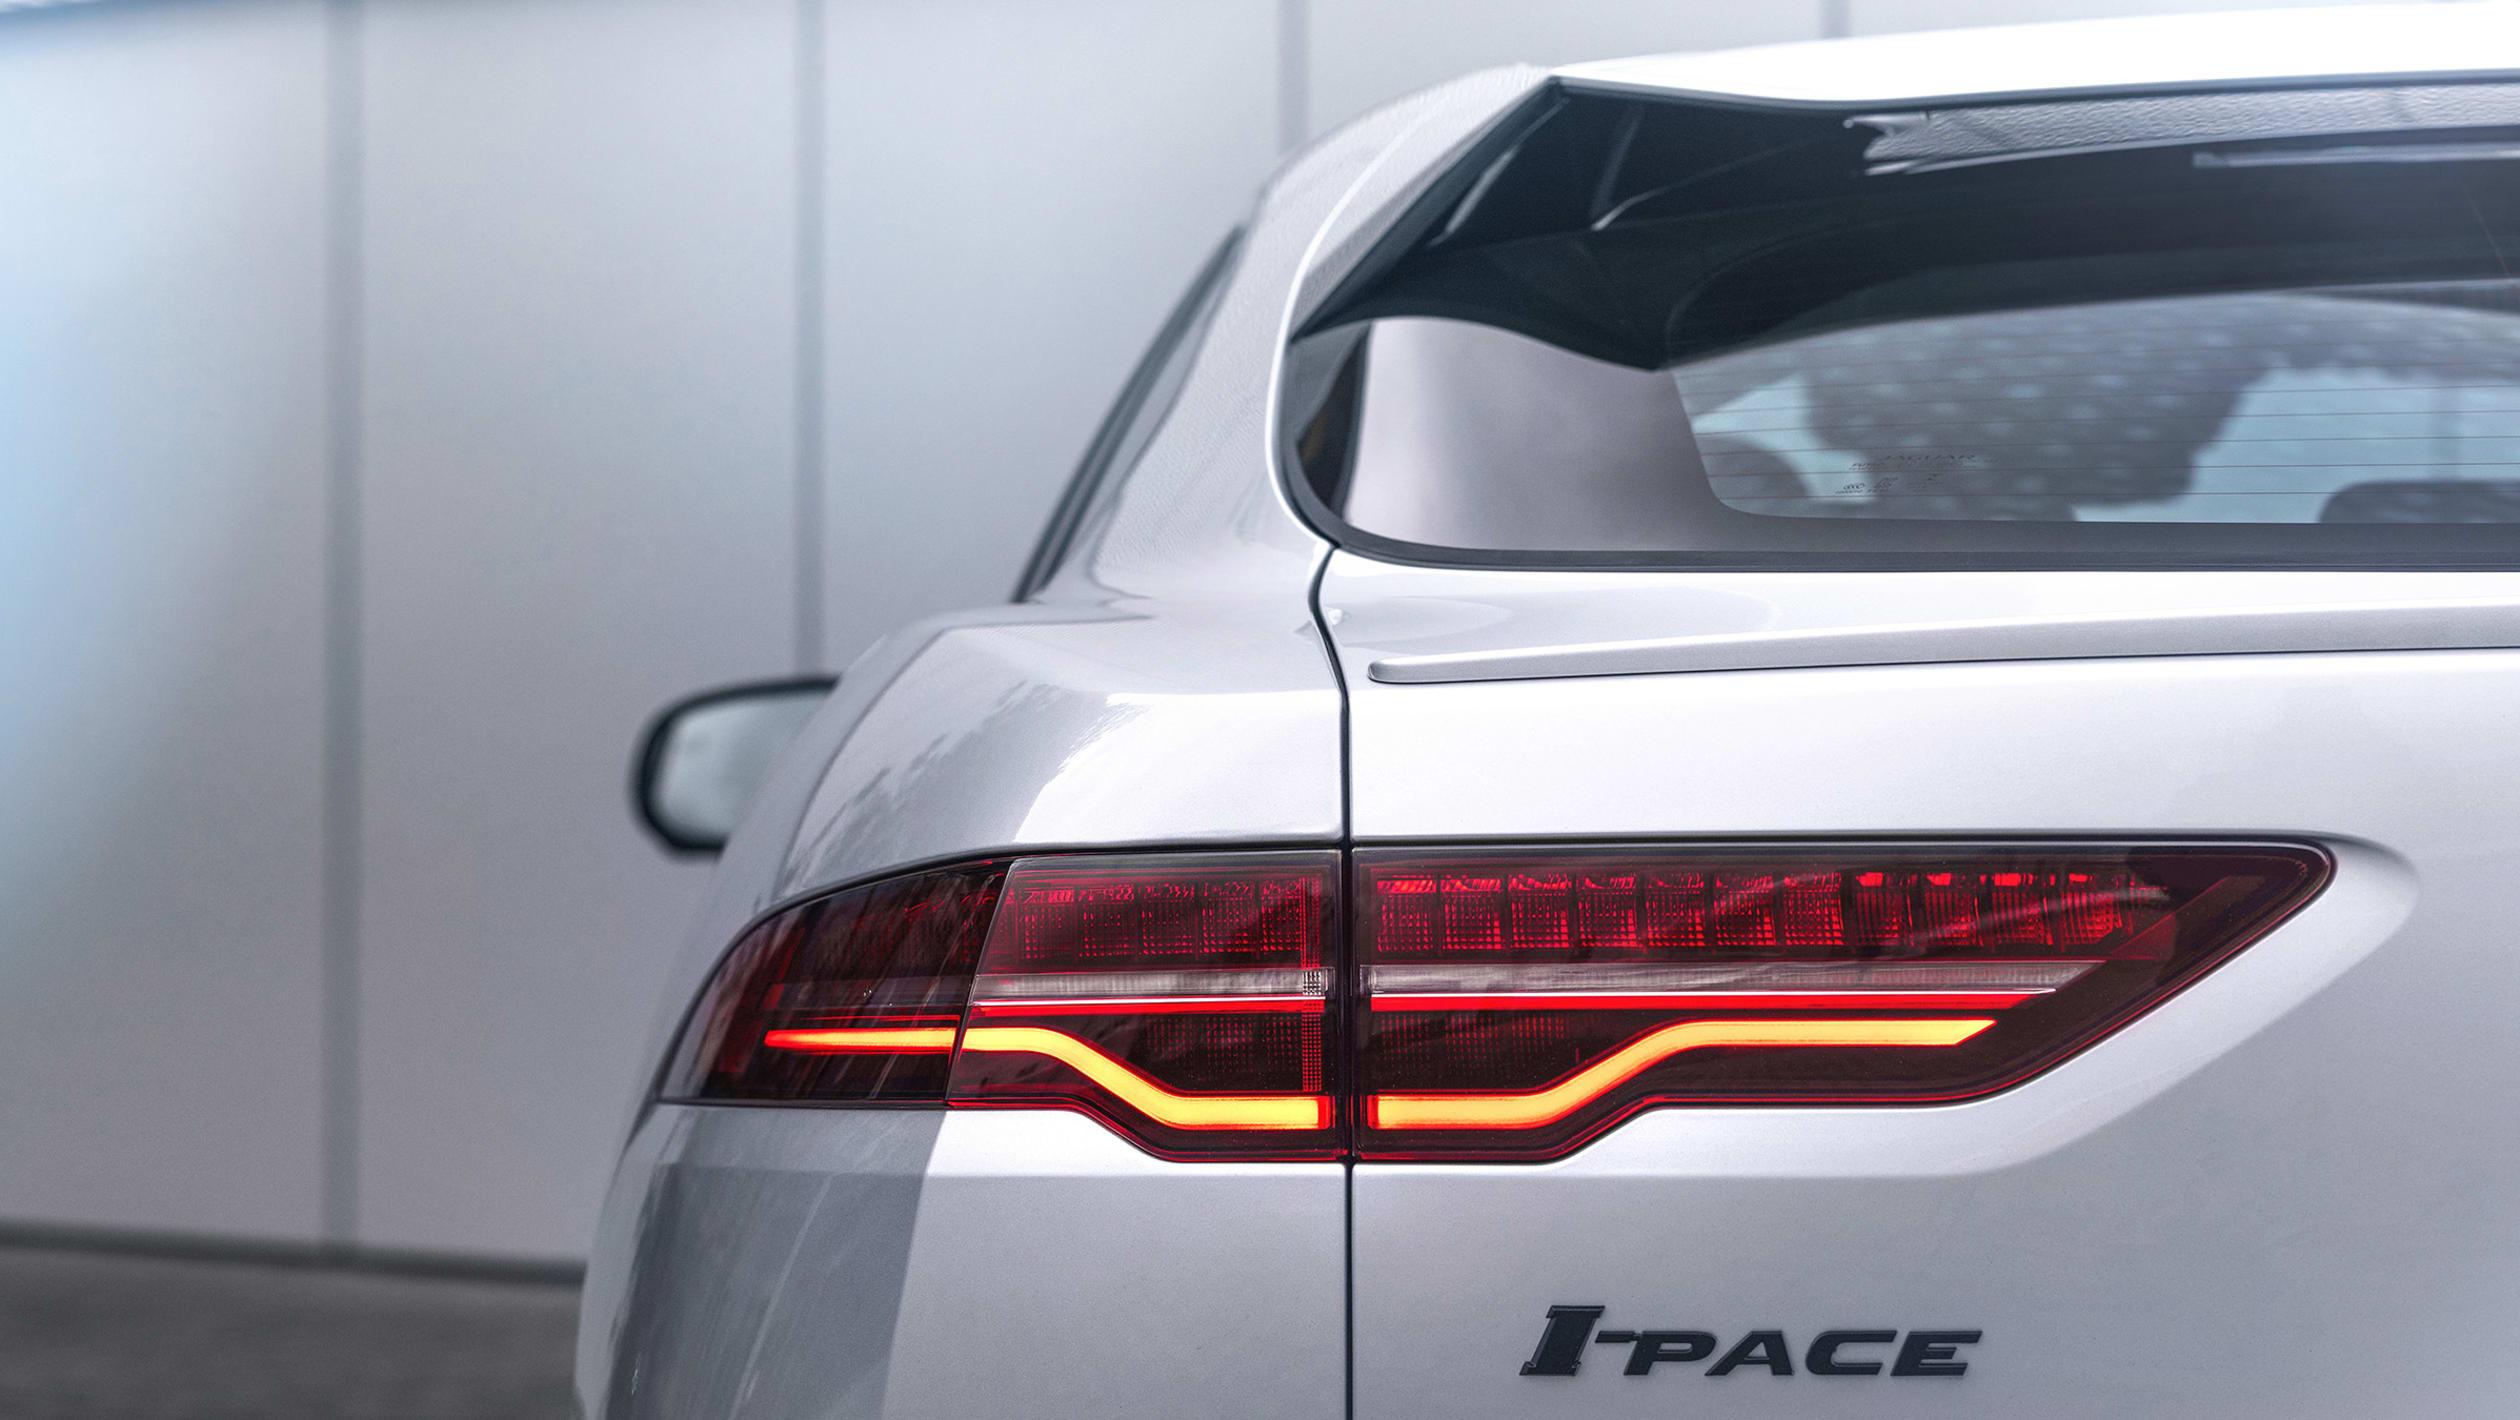 2020 jaguar I-Pace elektrikli otomobil fiyatları https://huglero.com